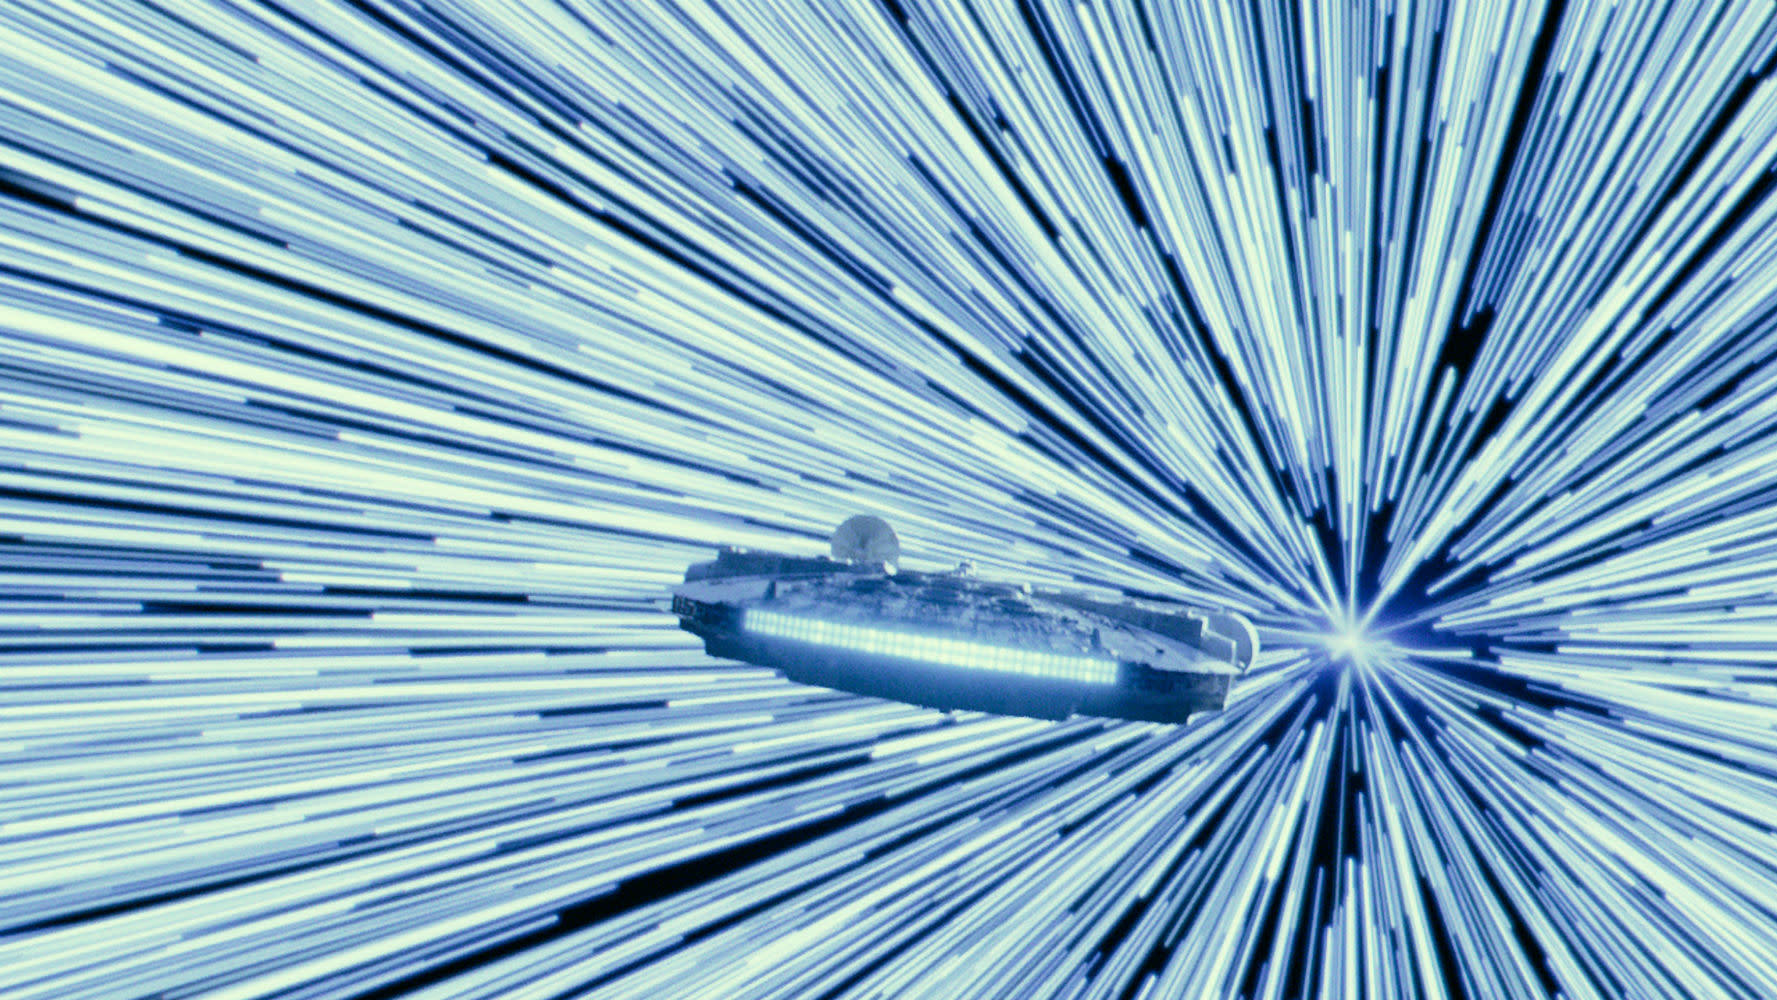 20190516-Star-Wars-02.jpg